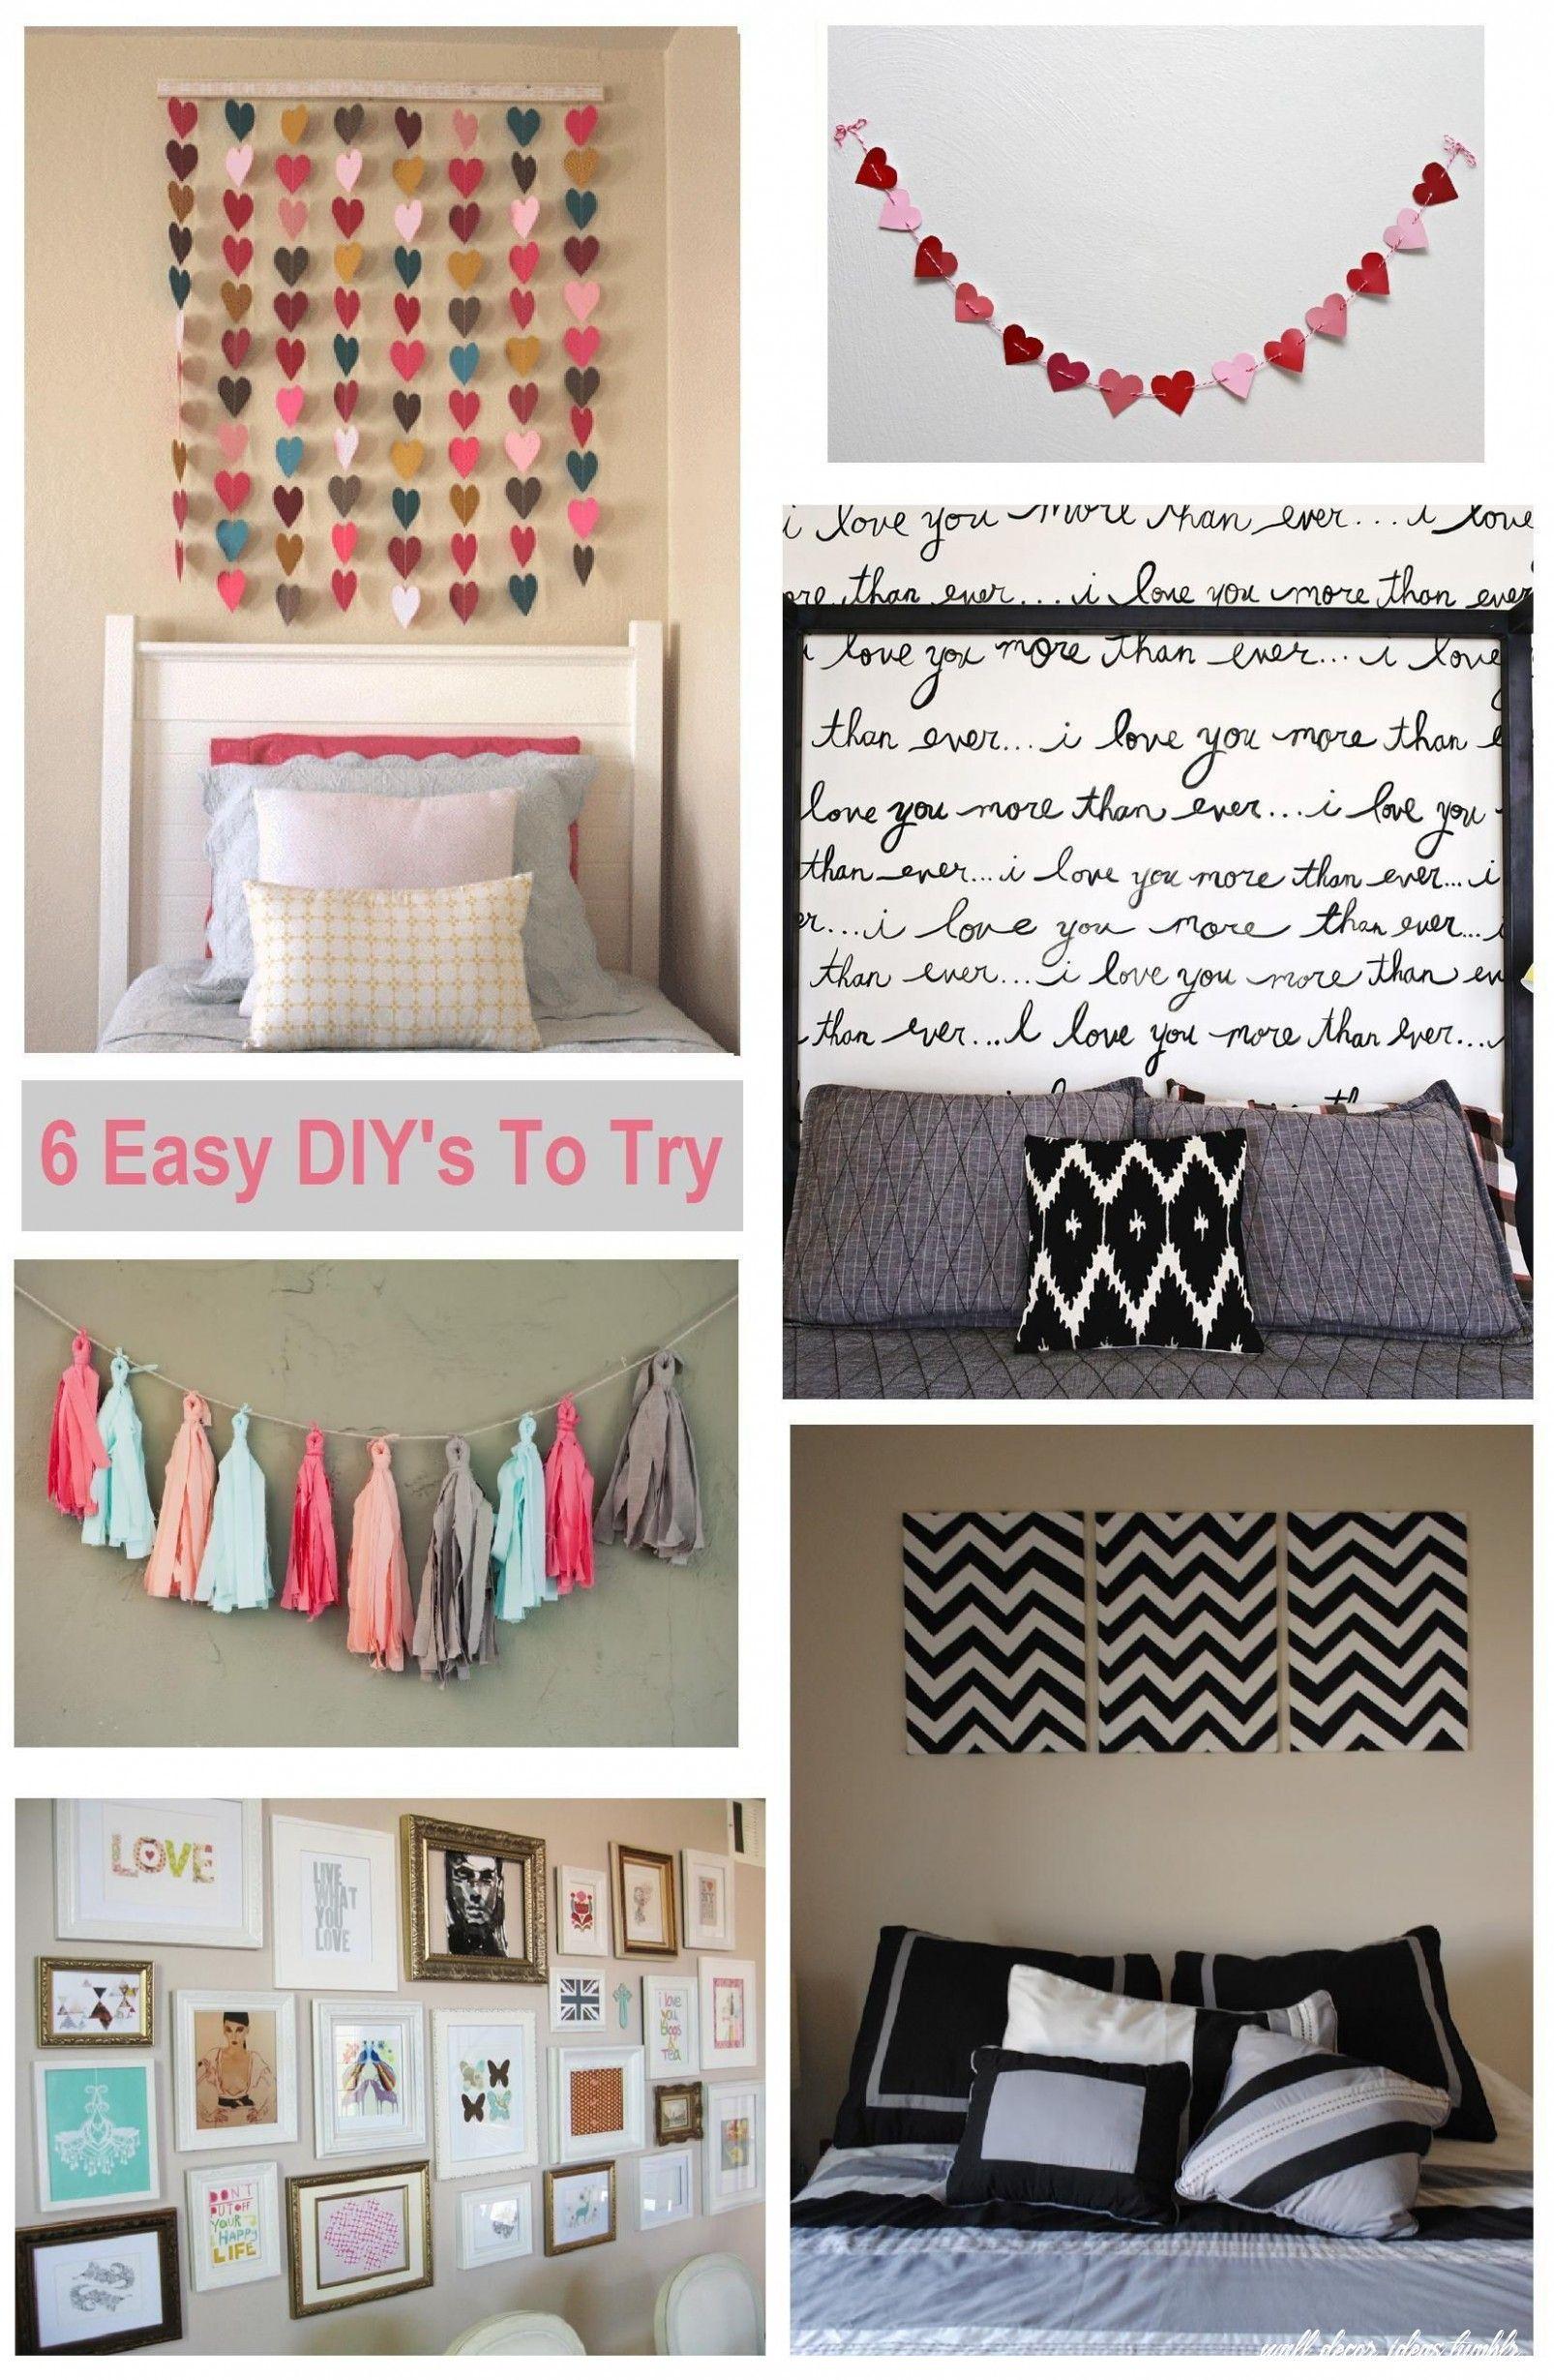 3 Wall Decor Ideas Tumblr in 3  Diy room decor, Bedroom diy